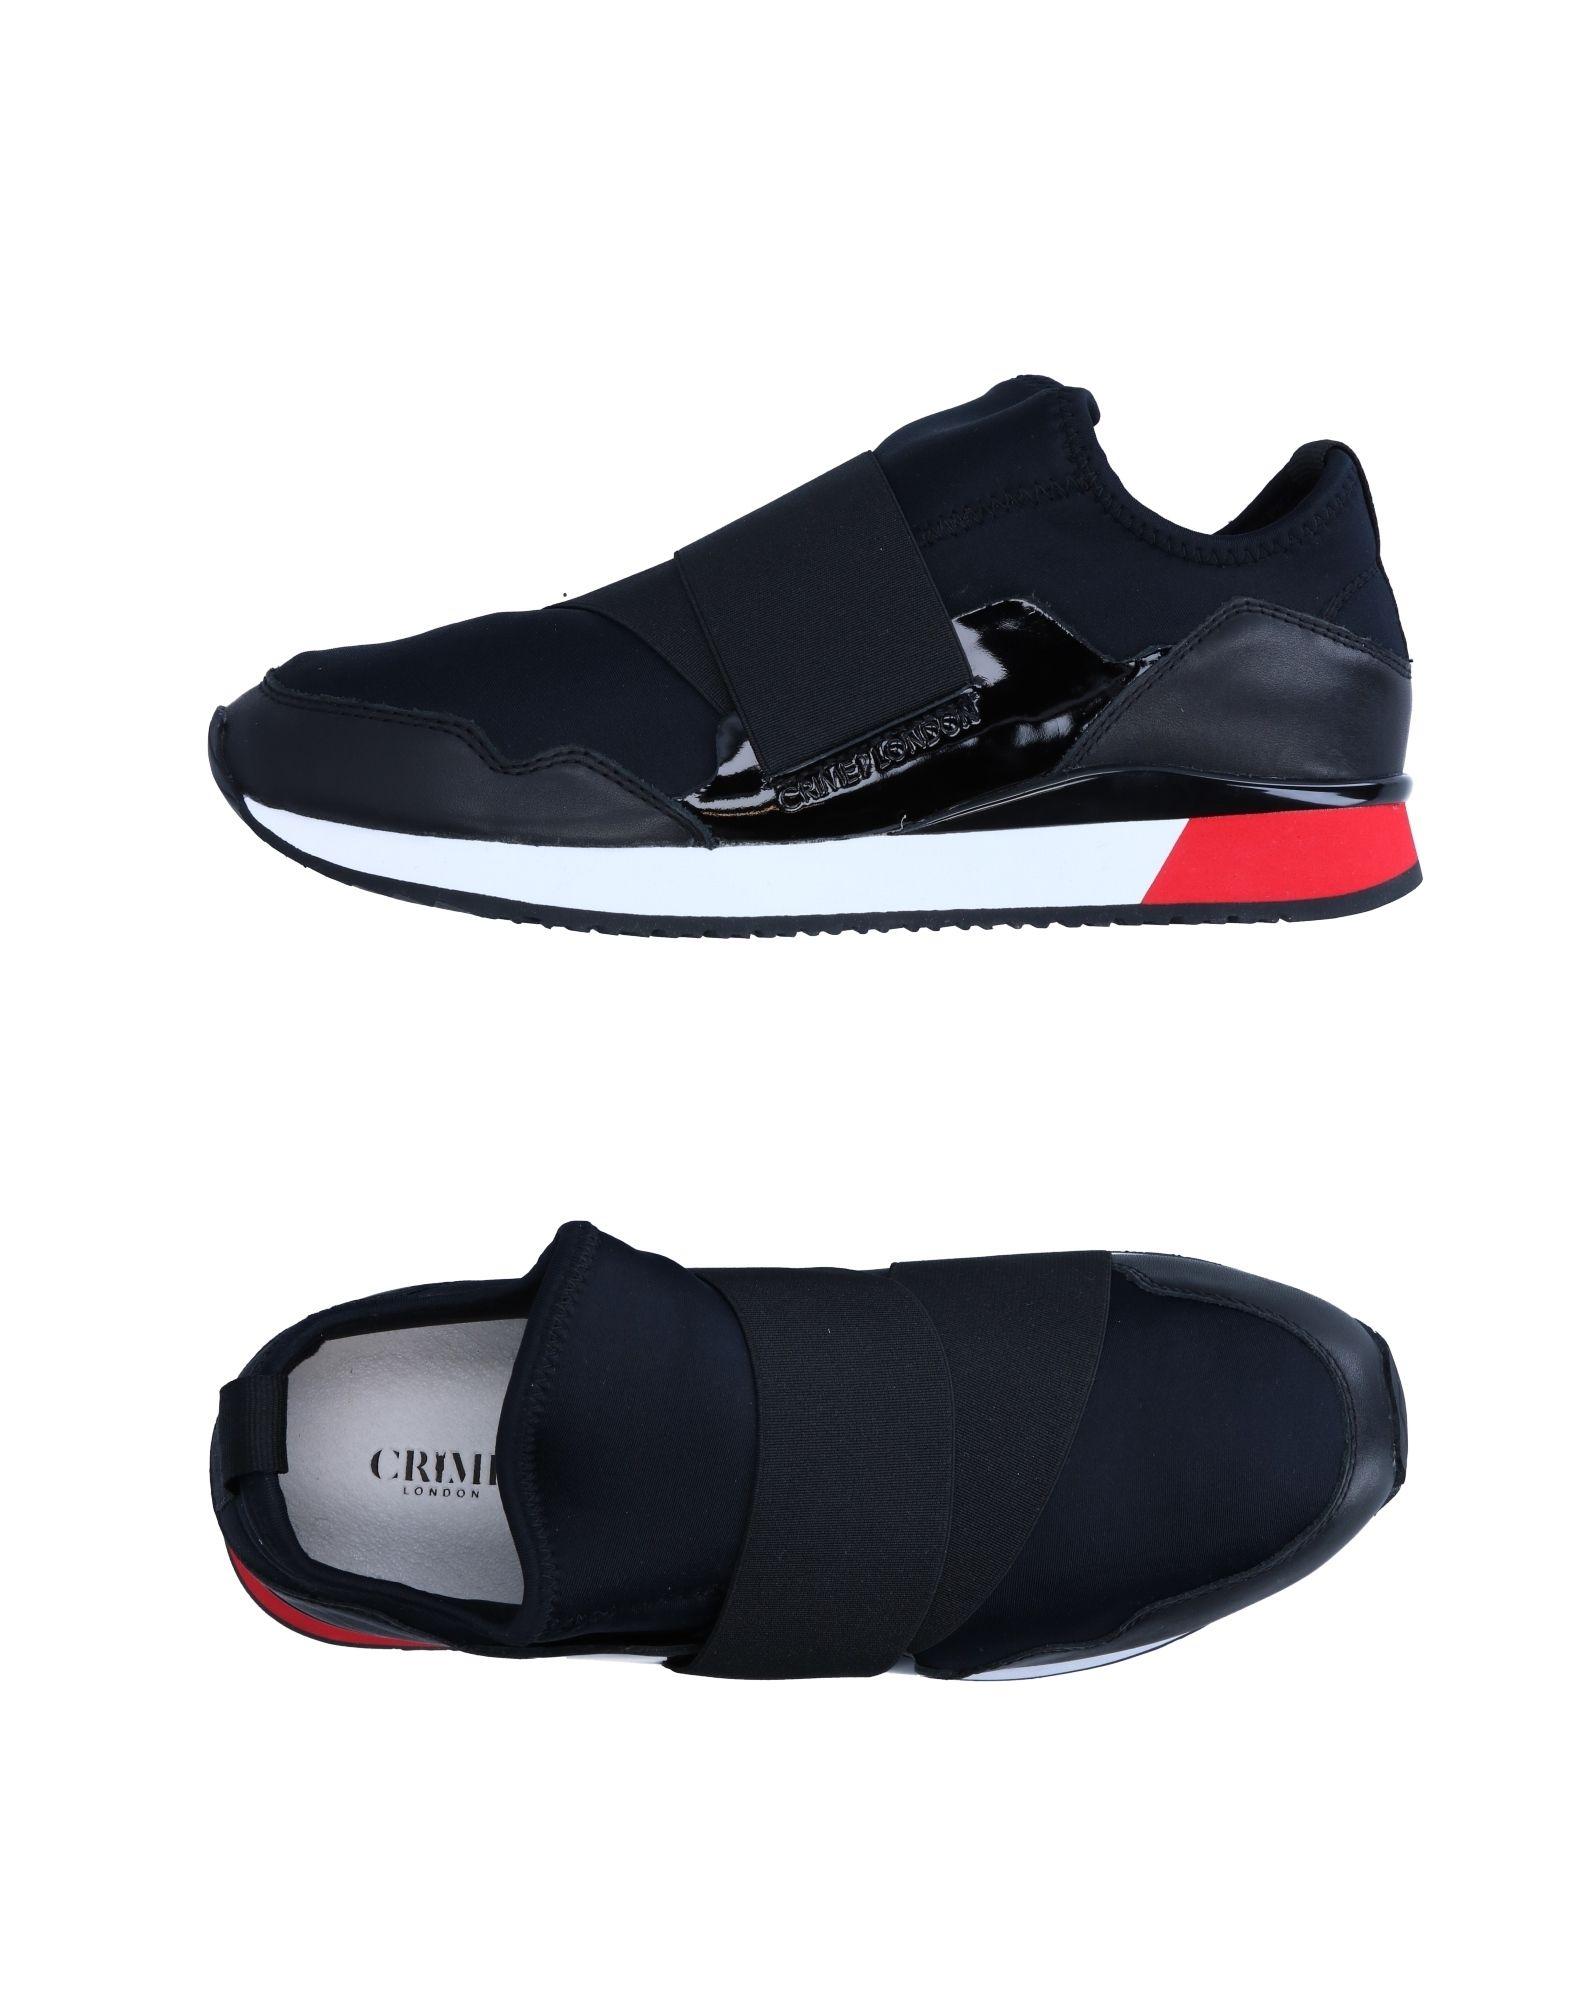 Crime London Sneakers beliebte Damen  11268557LR Gute Qualität beliebte Sneakers Schuhe 46f1d4